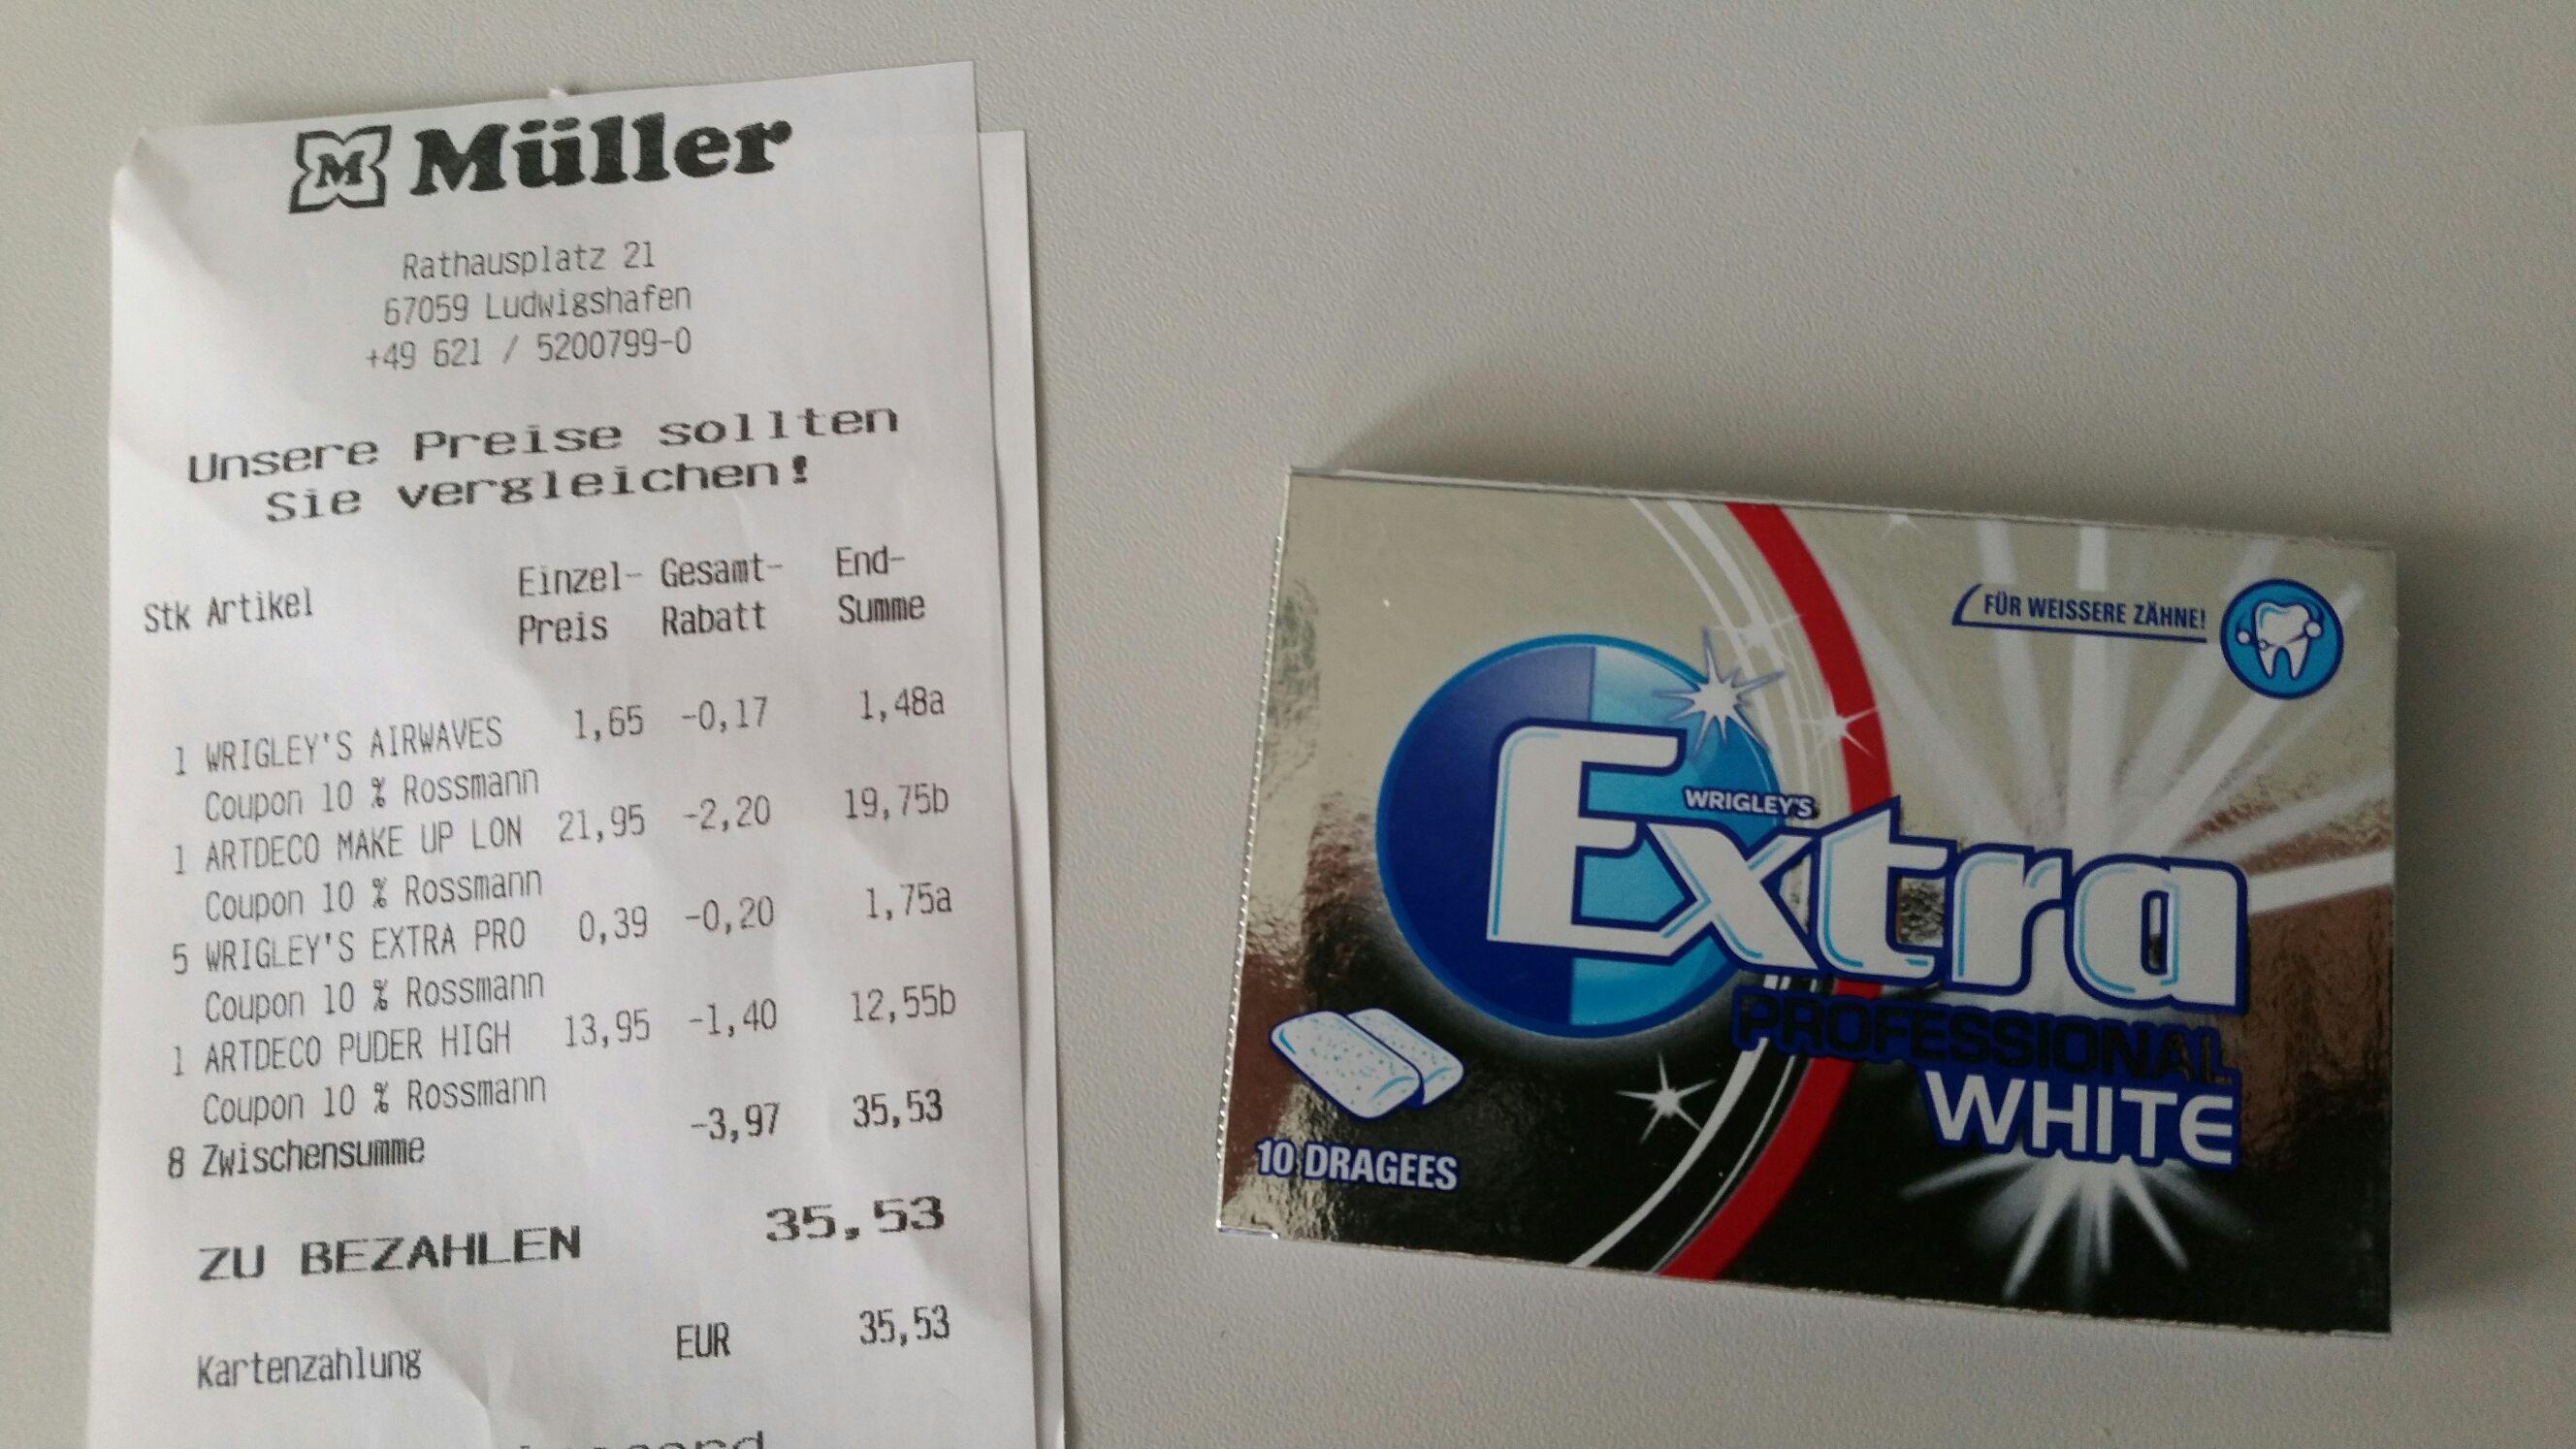 (Müller Ludwigshafen) Wrigley's Extra Professional White Kaugummis: € 0,35/10 Stk.!